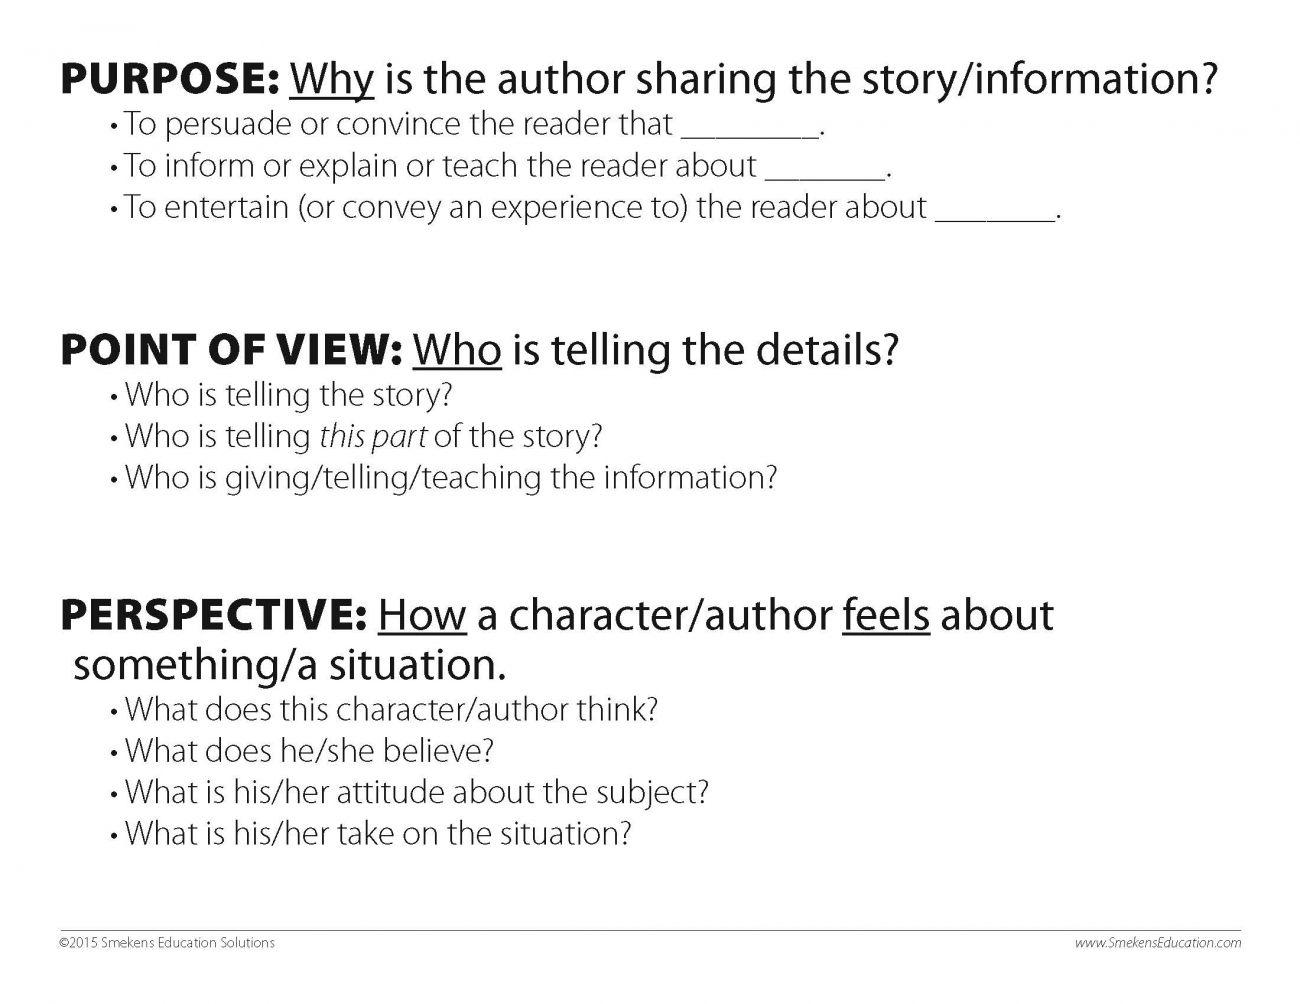 medium resolution of 6 Traits of Writing – Professional Development - Clarify \u003cI\u003ePurpose\u003c/I\u003e  versus \u003cI\u003ePoint of View\u003c…   Authors perspective